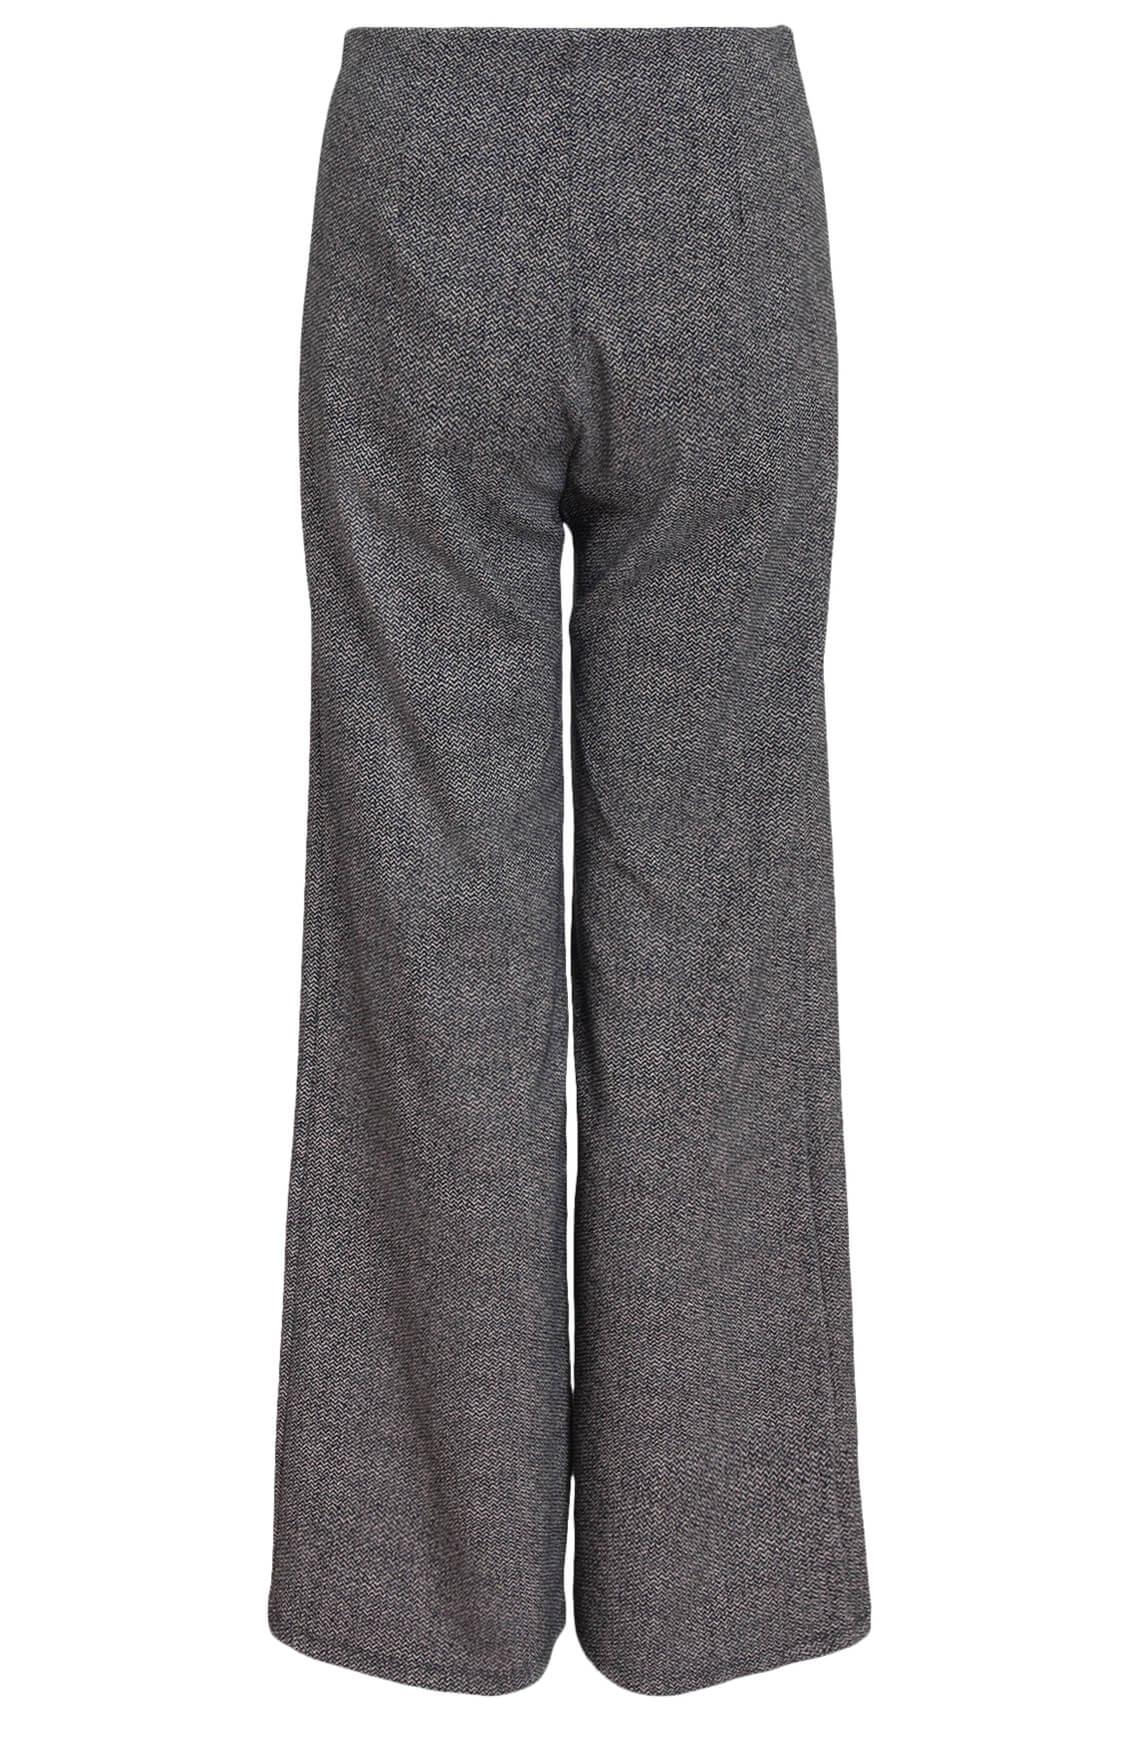 La Fée Maraboutée Dames Jacquard broek zwart